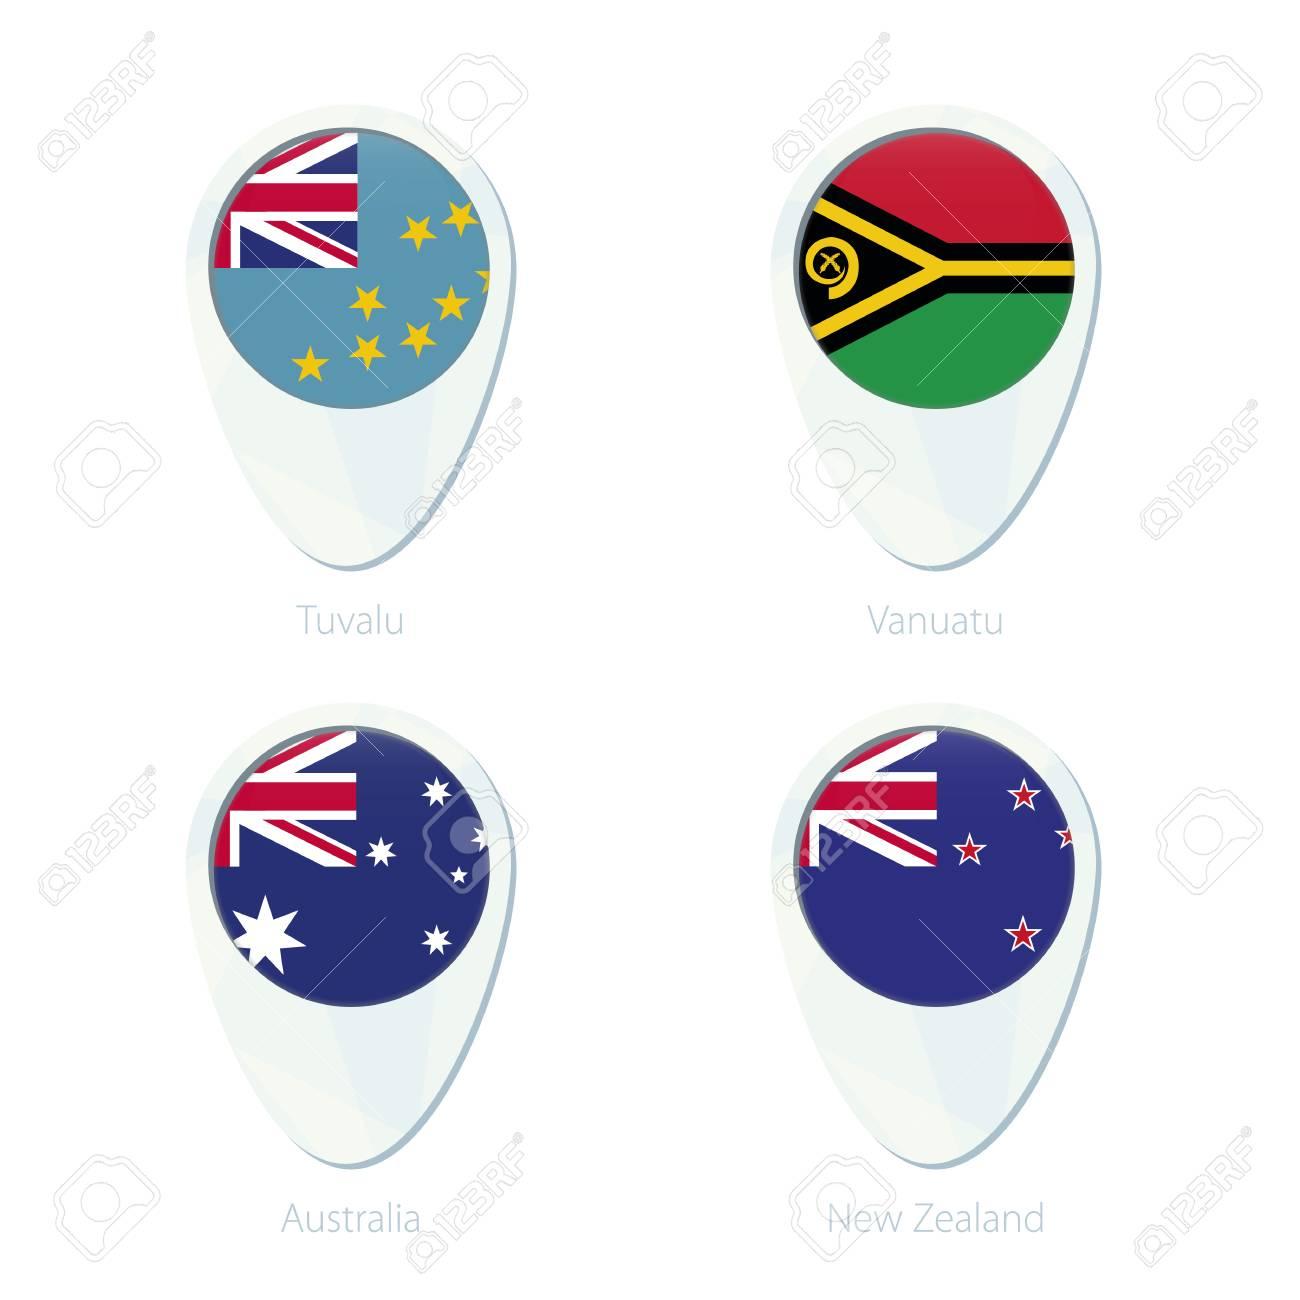 Tuvalu Vanuatu Australia New Zealand Flag Location Map Pin Icon